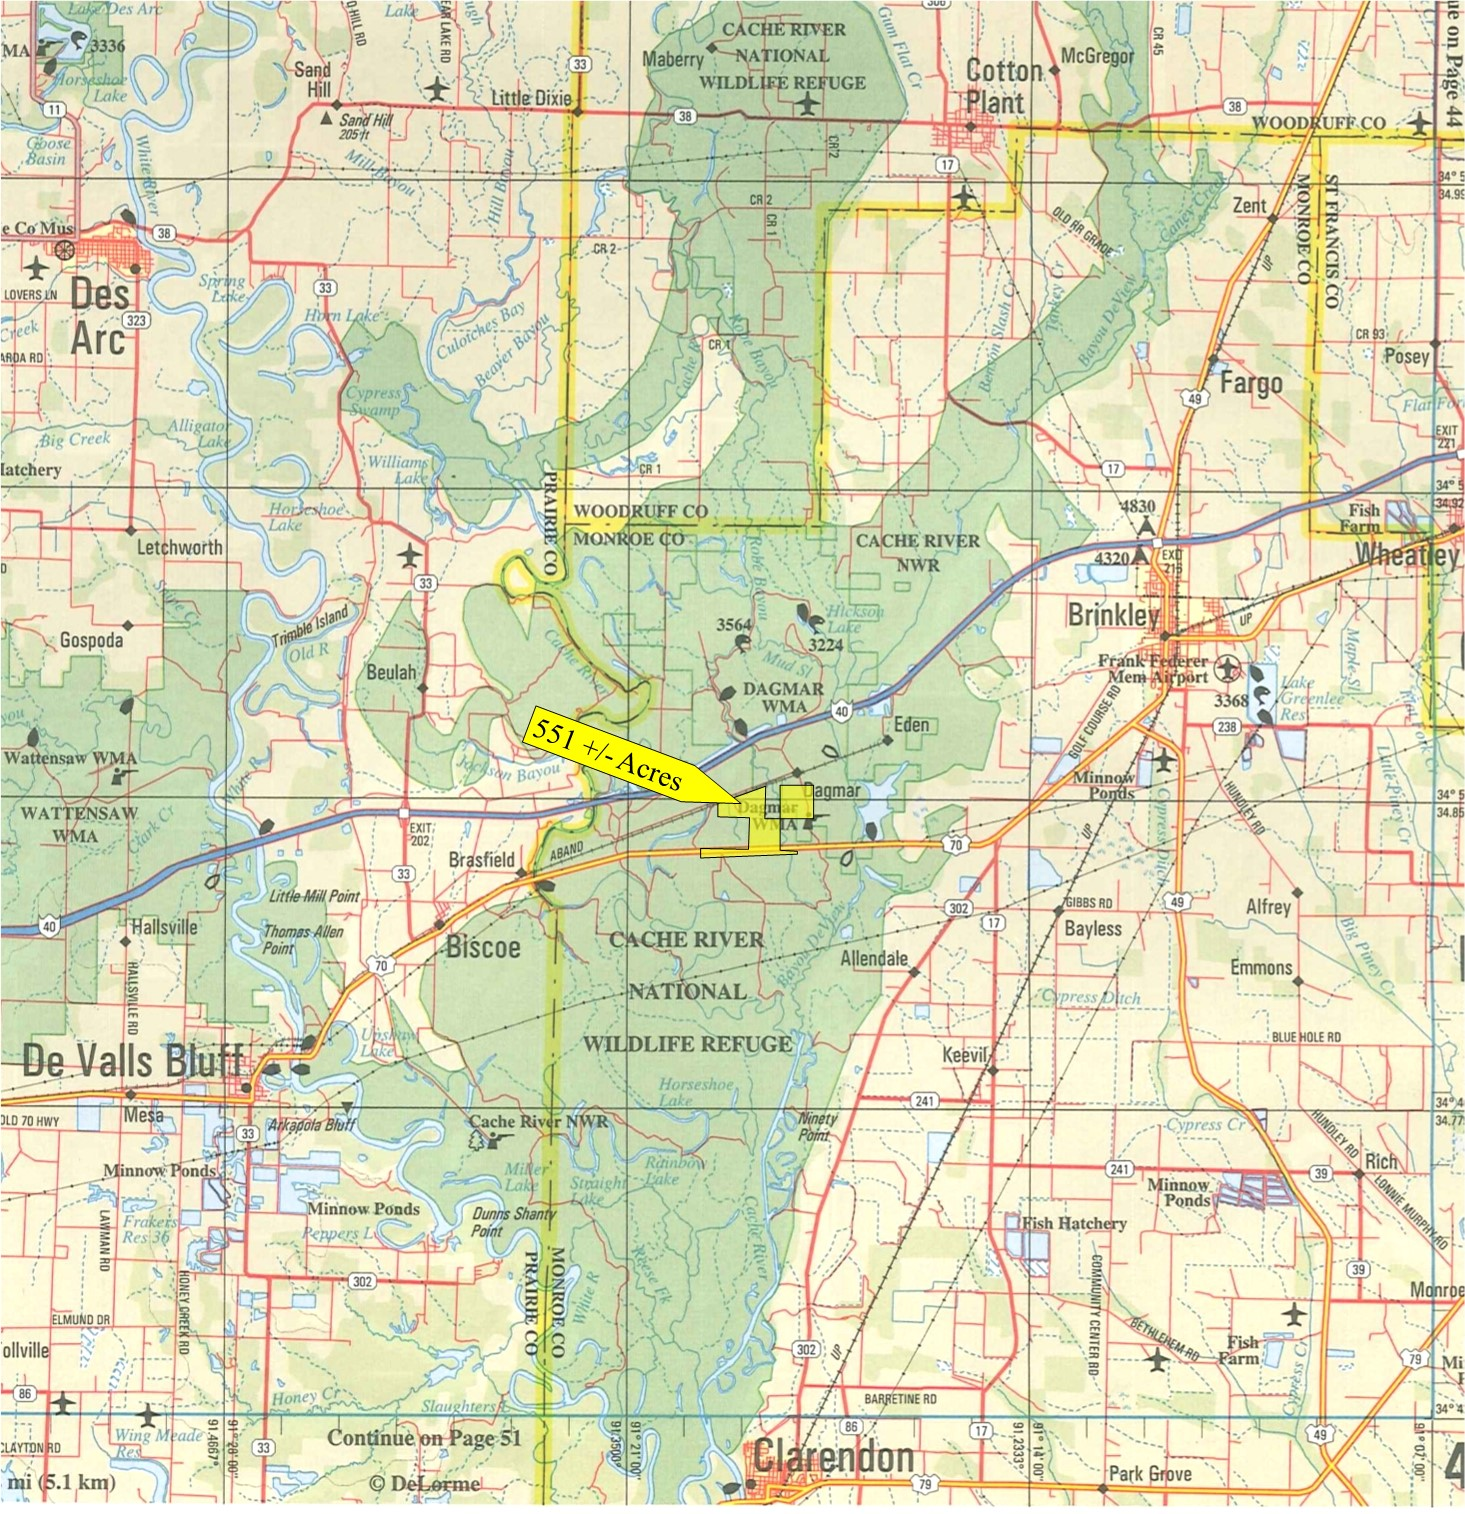 Acres Monroe County Arkansas Southern Land Company - Arkansas land ownership maps